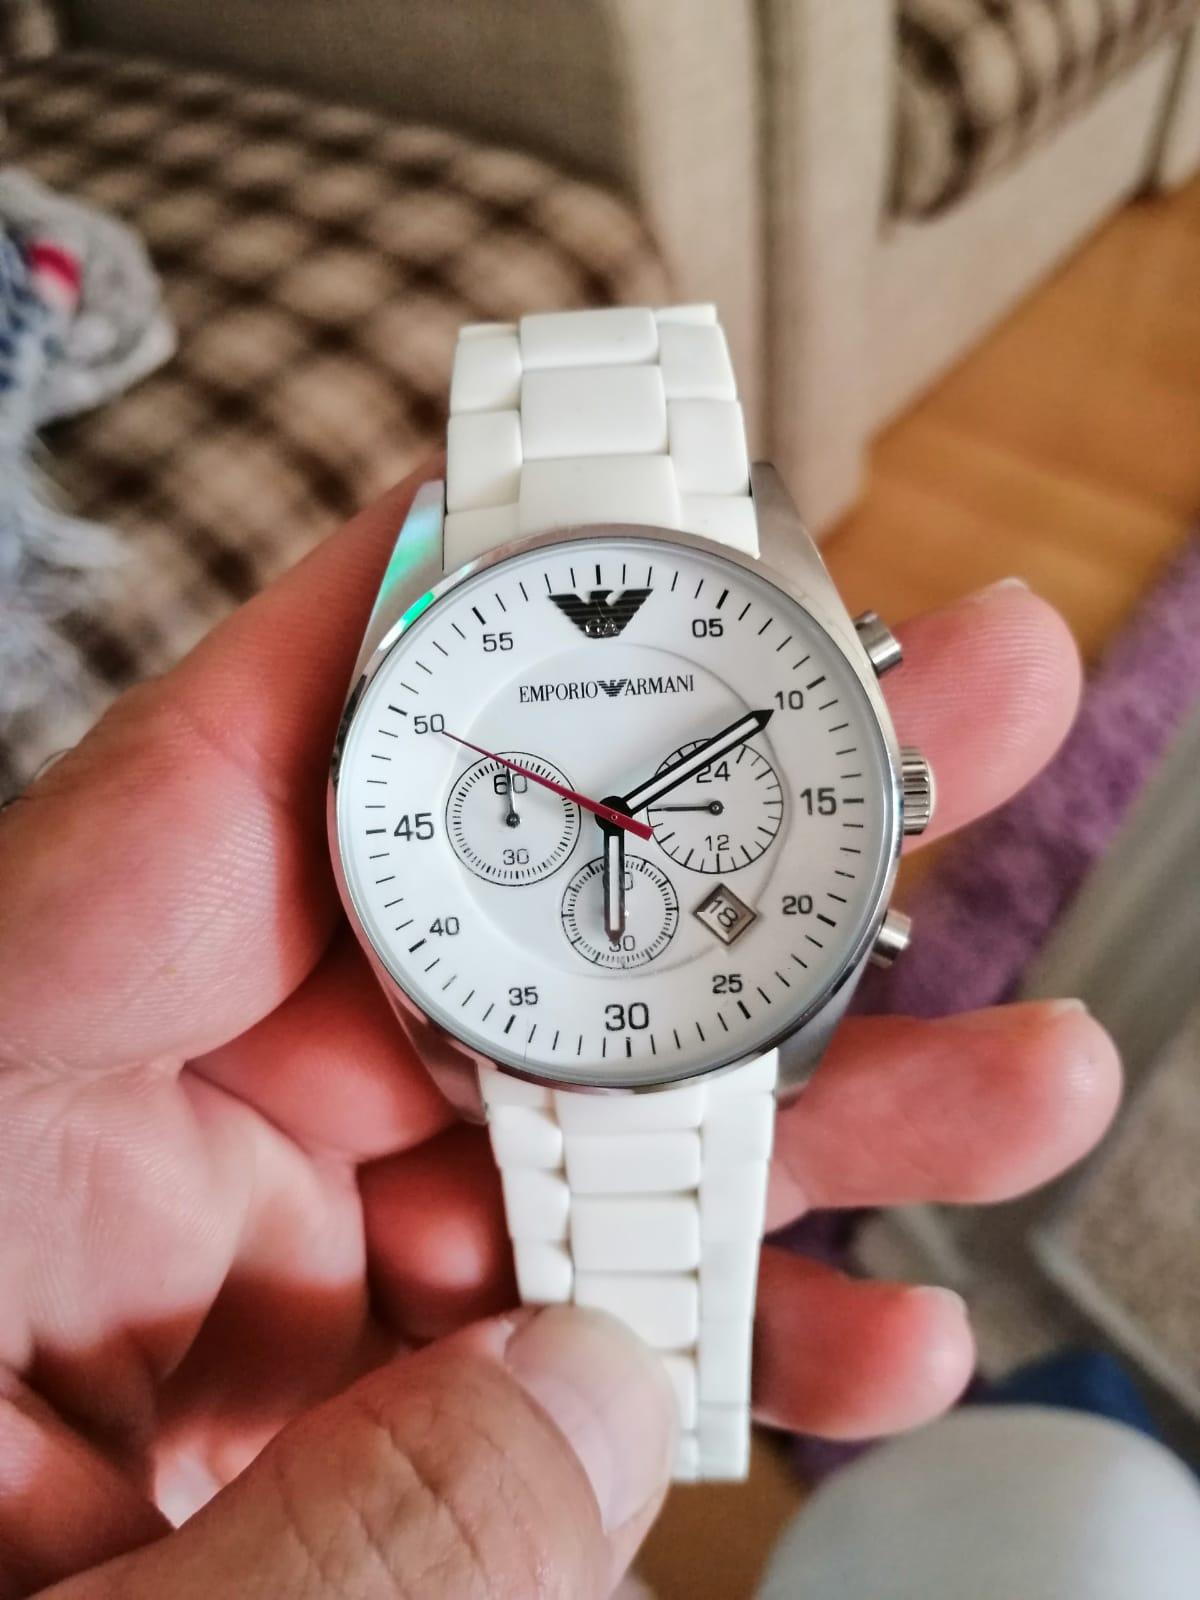 Emporio armani Bay Bayan Takım saati fiyatı 1500